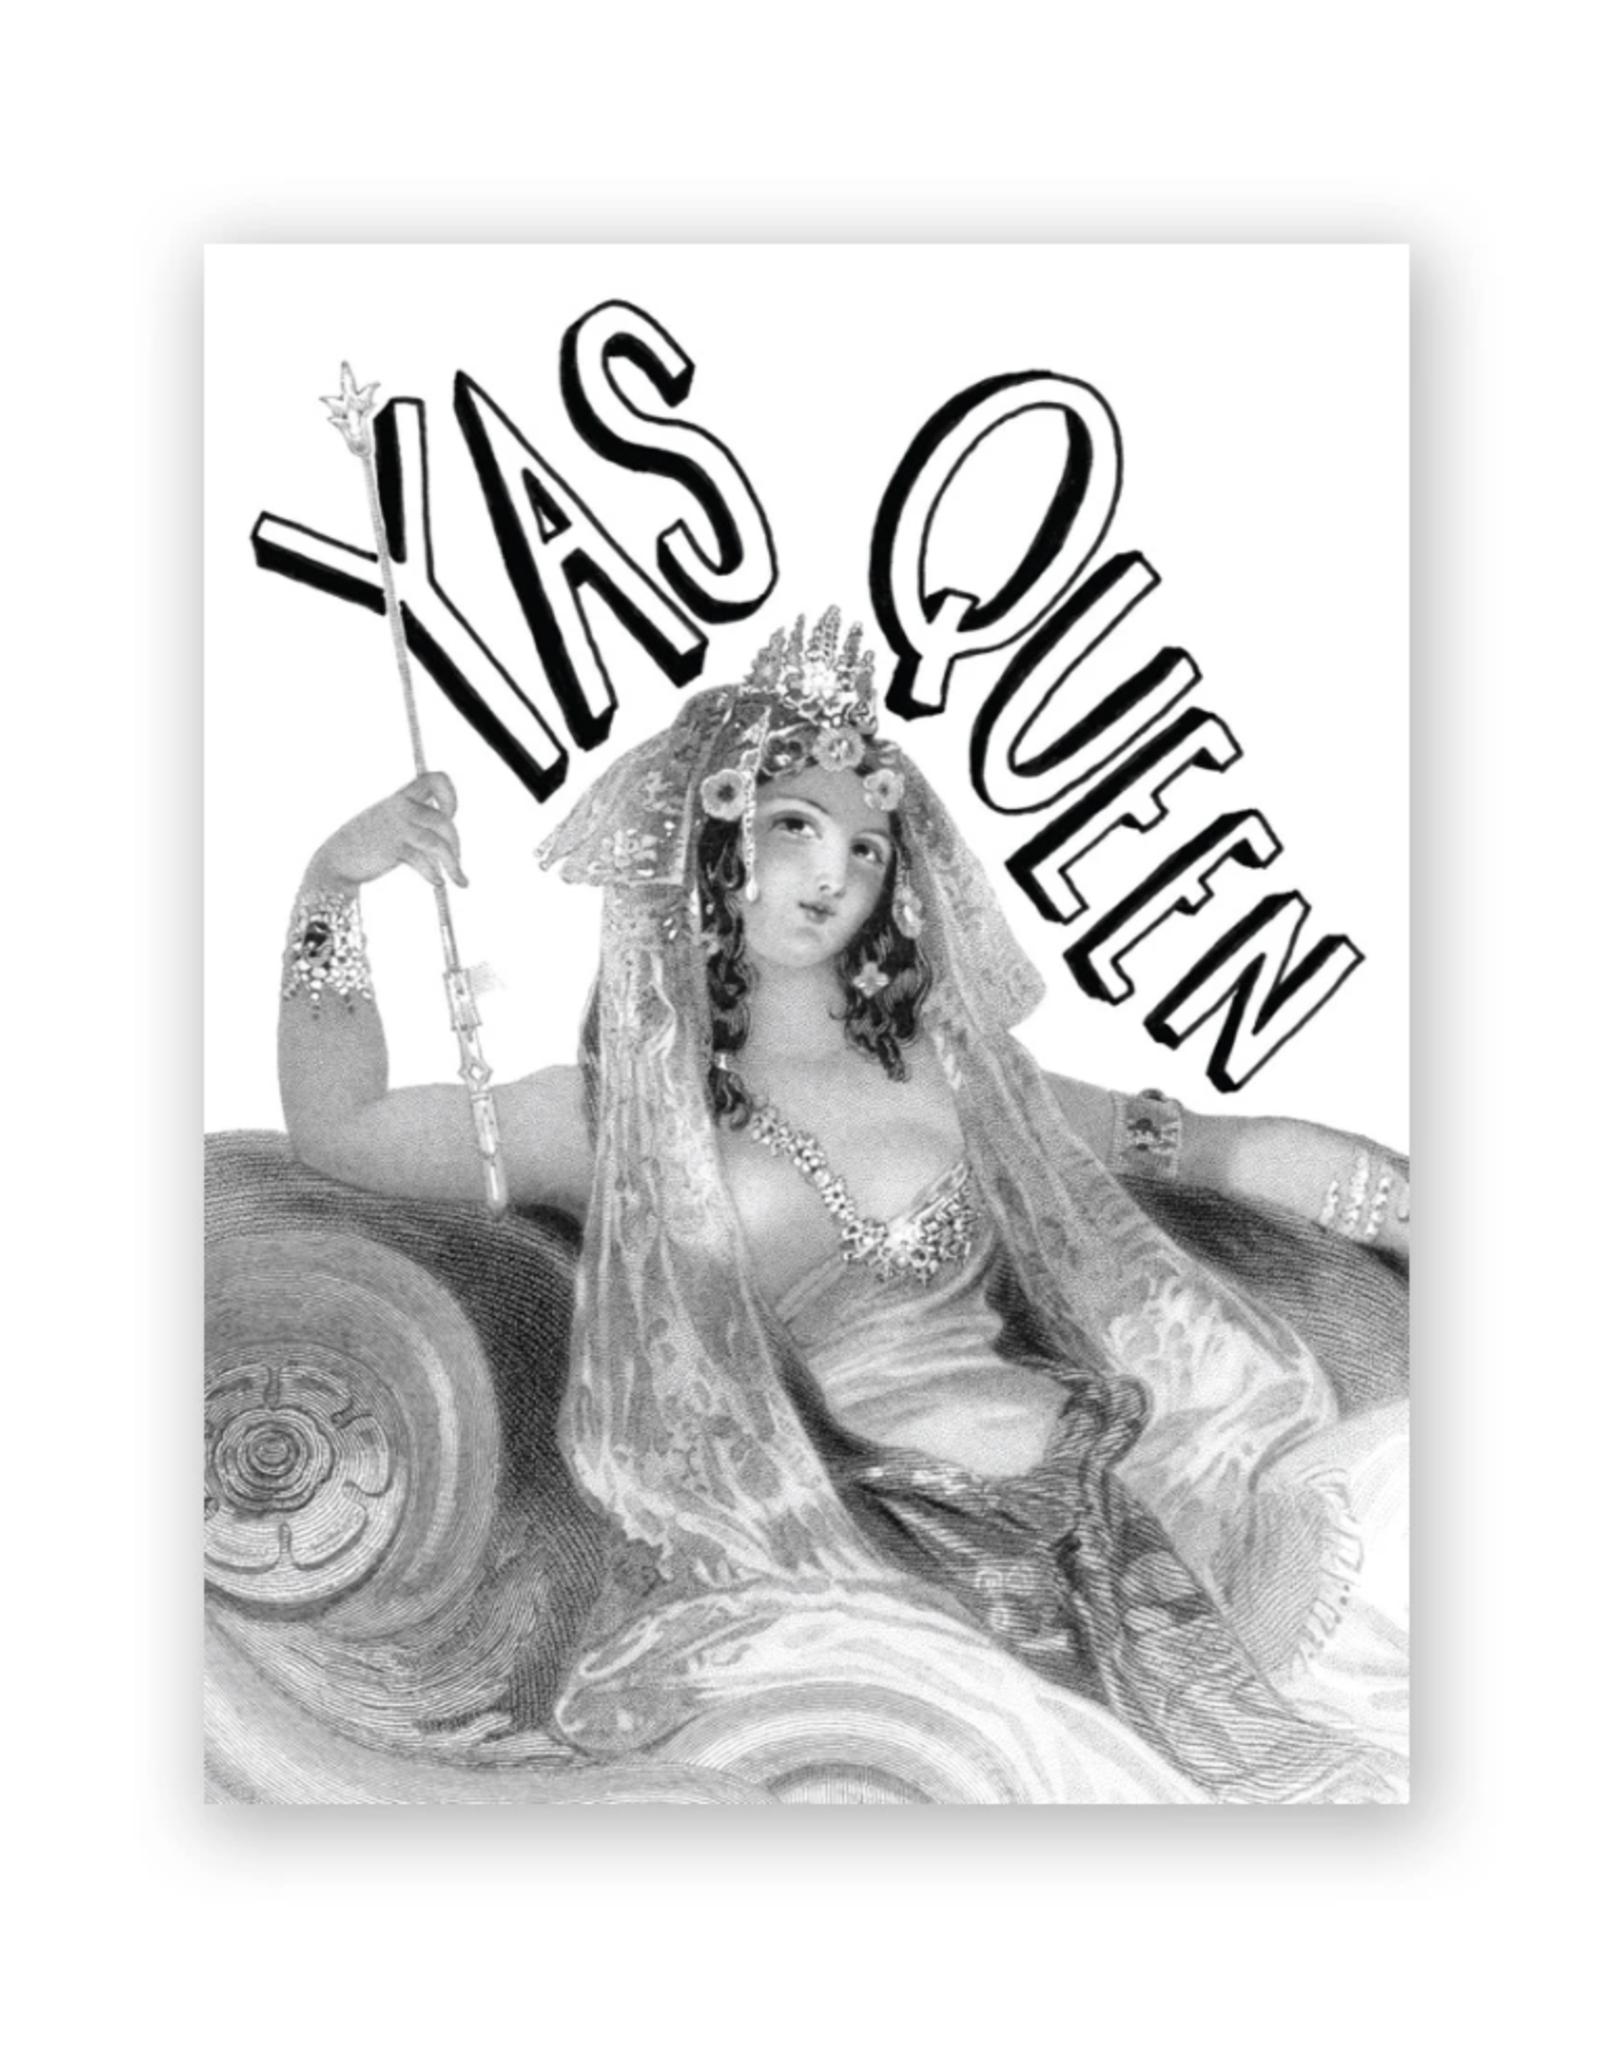 Mincing Mockingbird Yas Queen Greeting Card - The Mincing Mockingbird